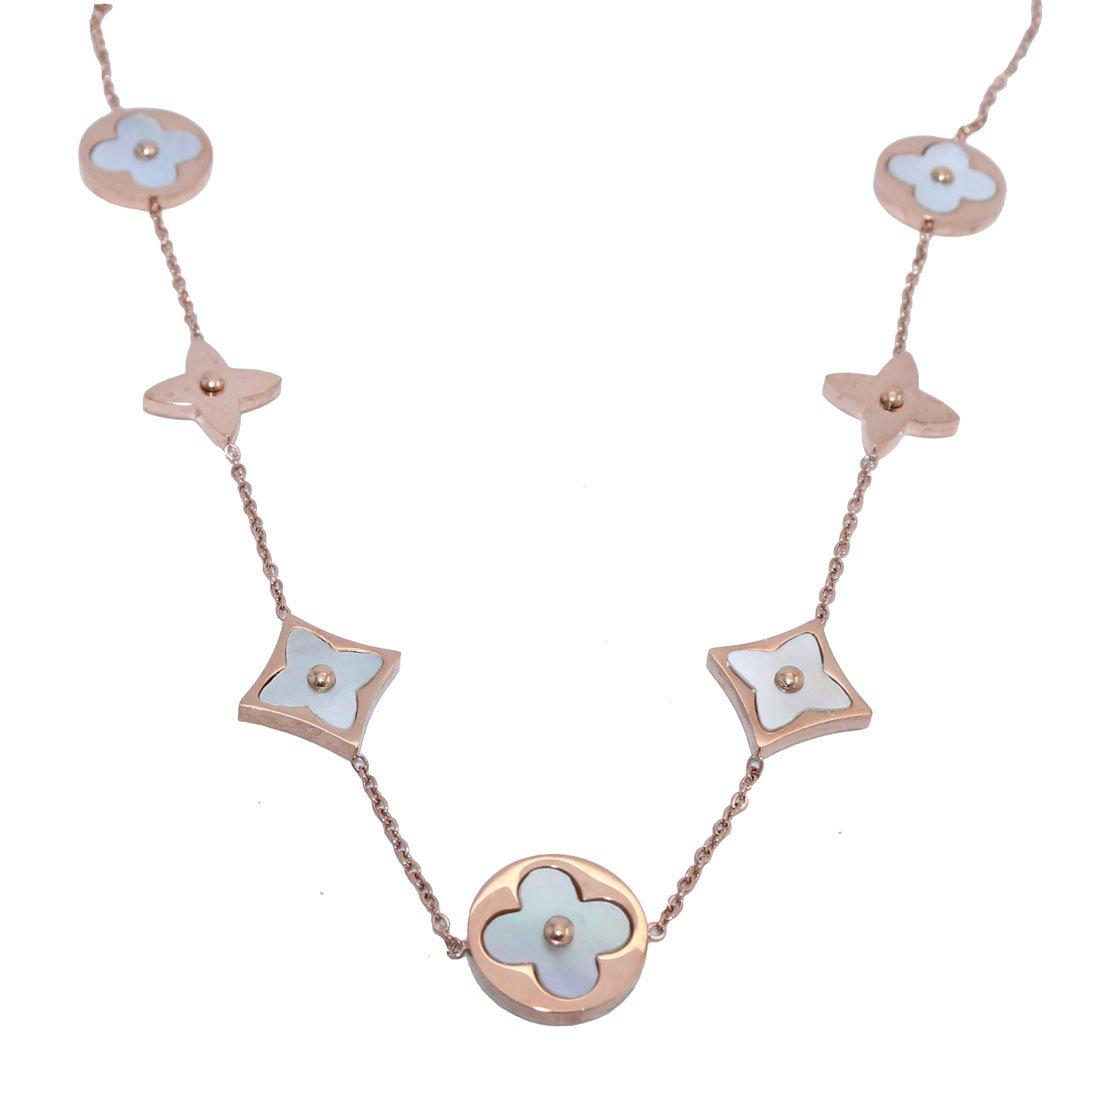 Baoliren White Shell Rose Gold Tone Round Multi Clover Women's Strand Necklace by Baoliren